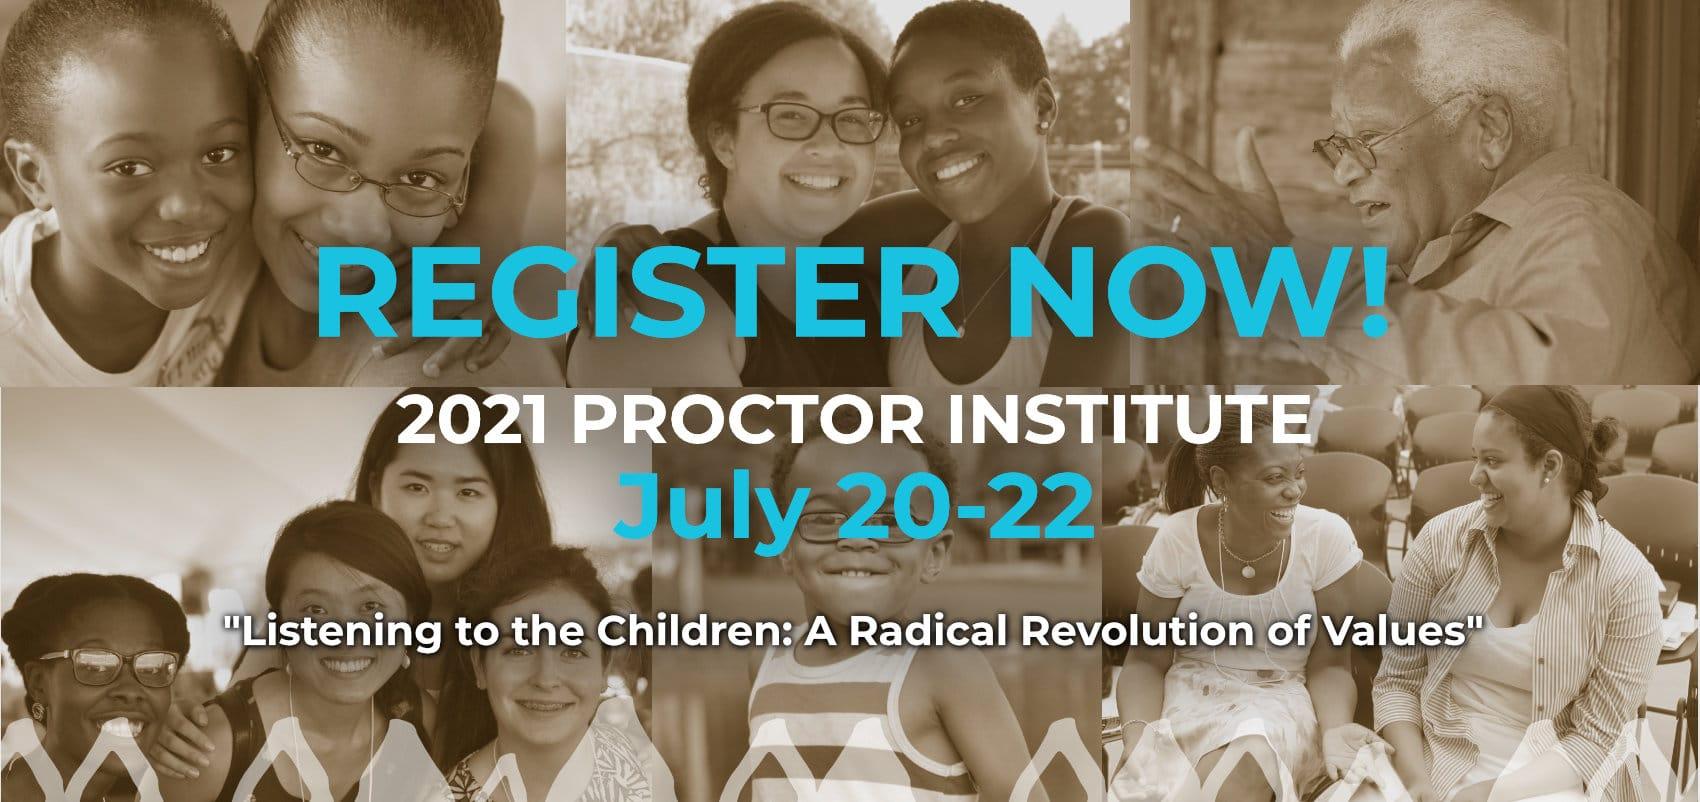 Register now for the 27th Annual CDF Samuel DeWitt Proctor Institute